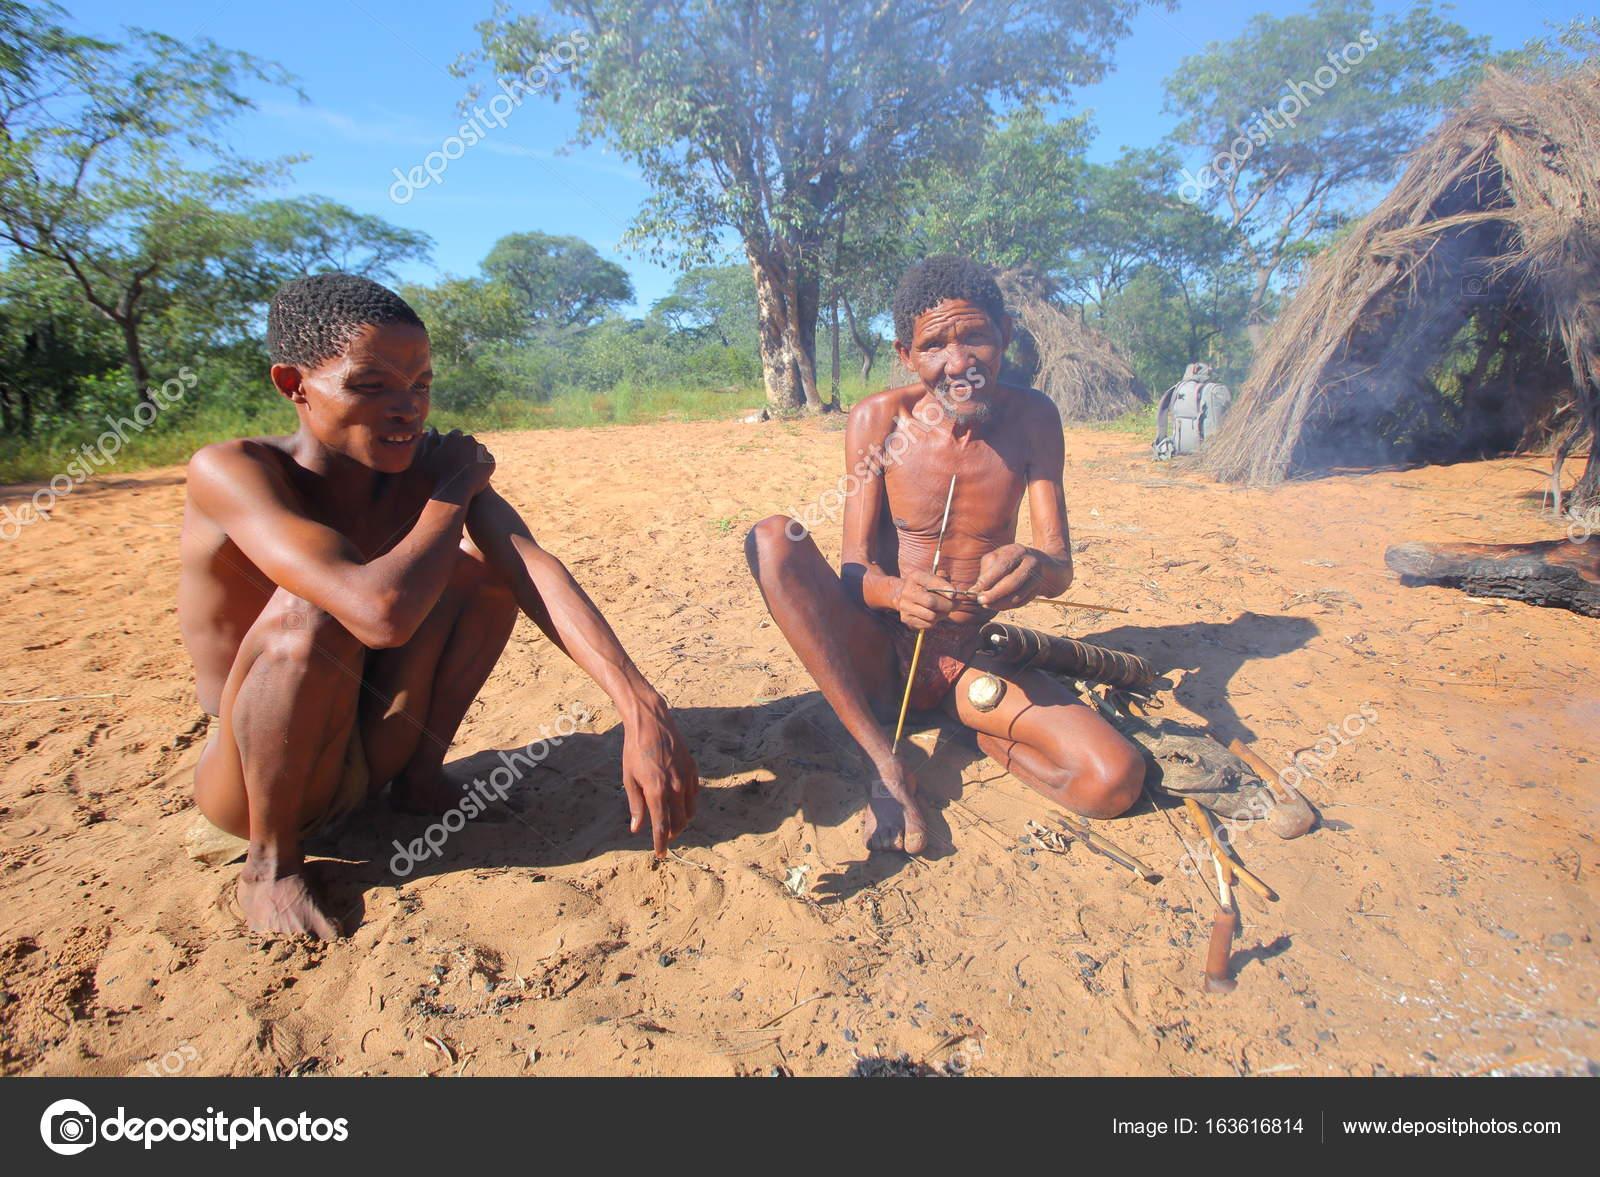 san bushmen of the kalahari desert